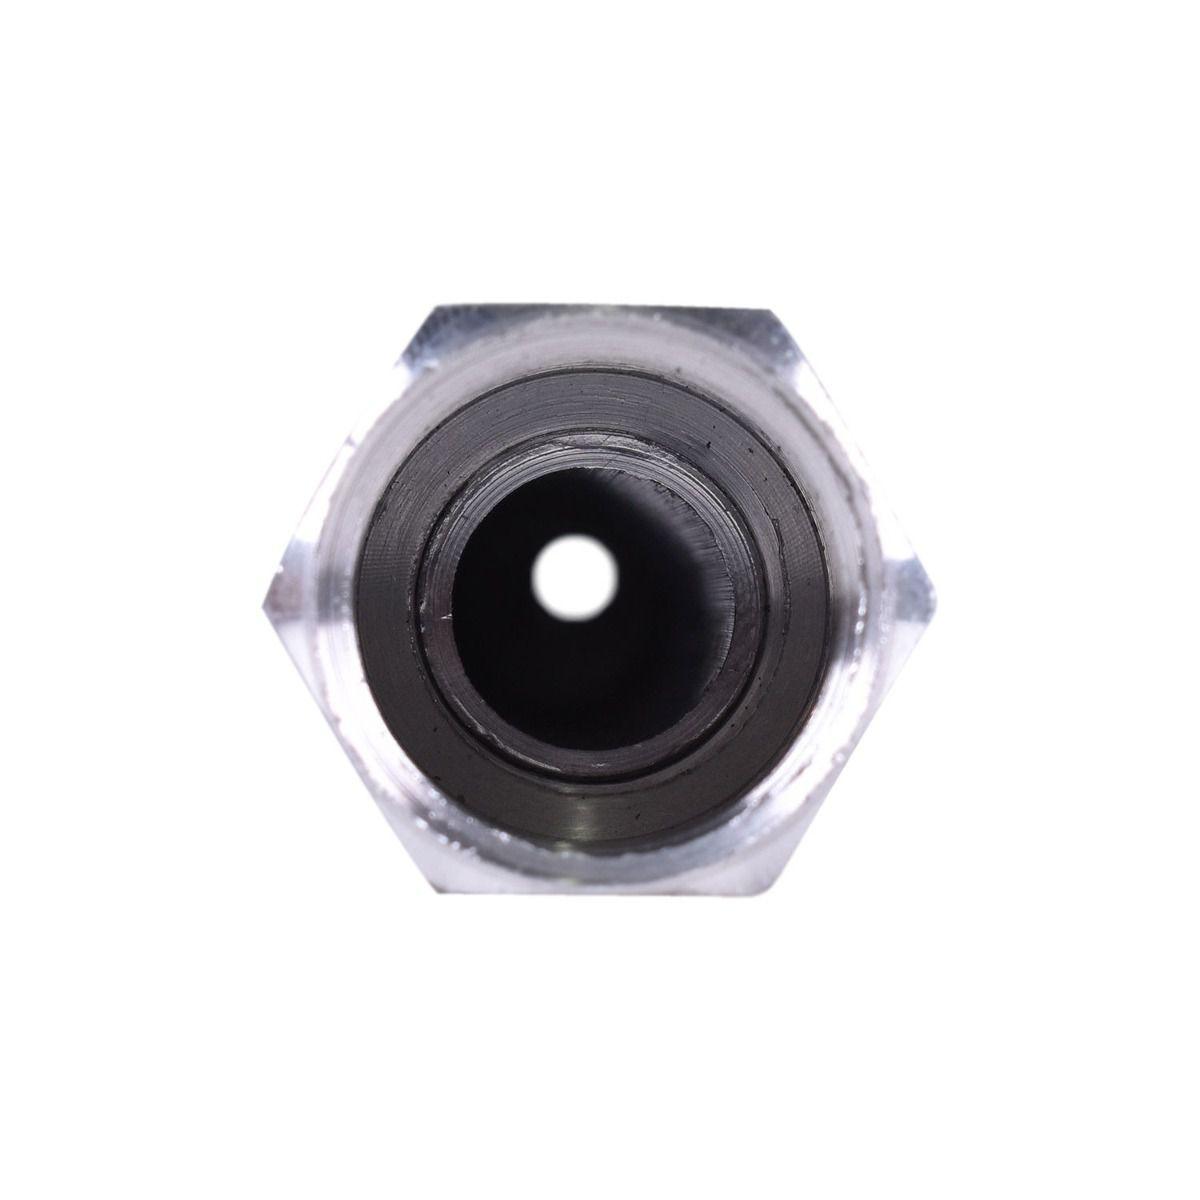 Bico Esguicho Curto Alta Pressão 110 mm - Schweers